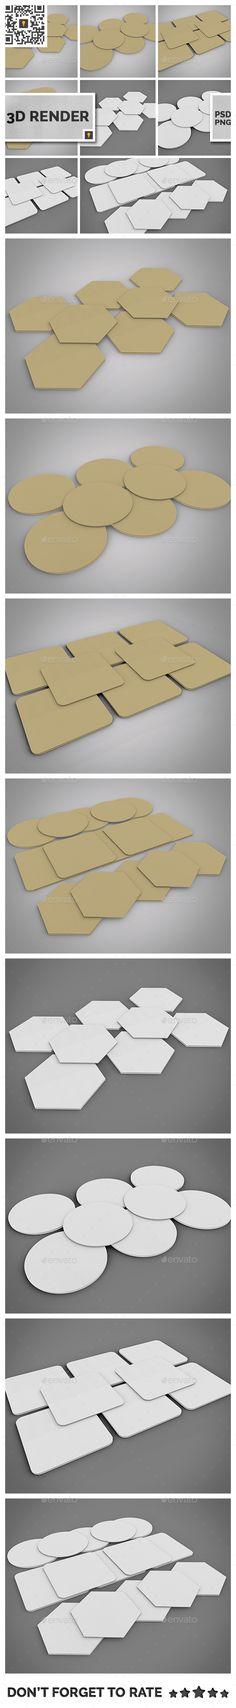 Paper Coaster 3D Render